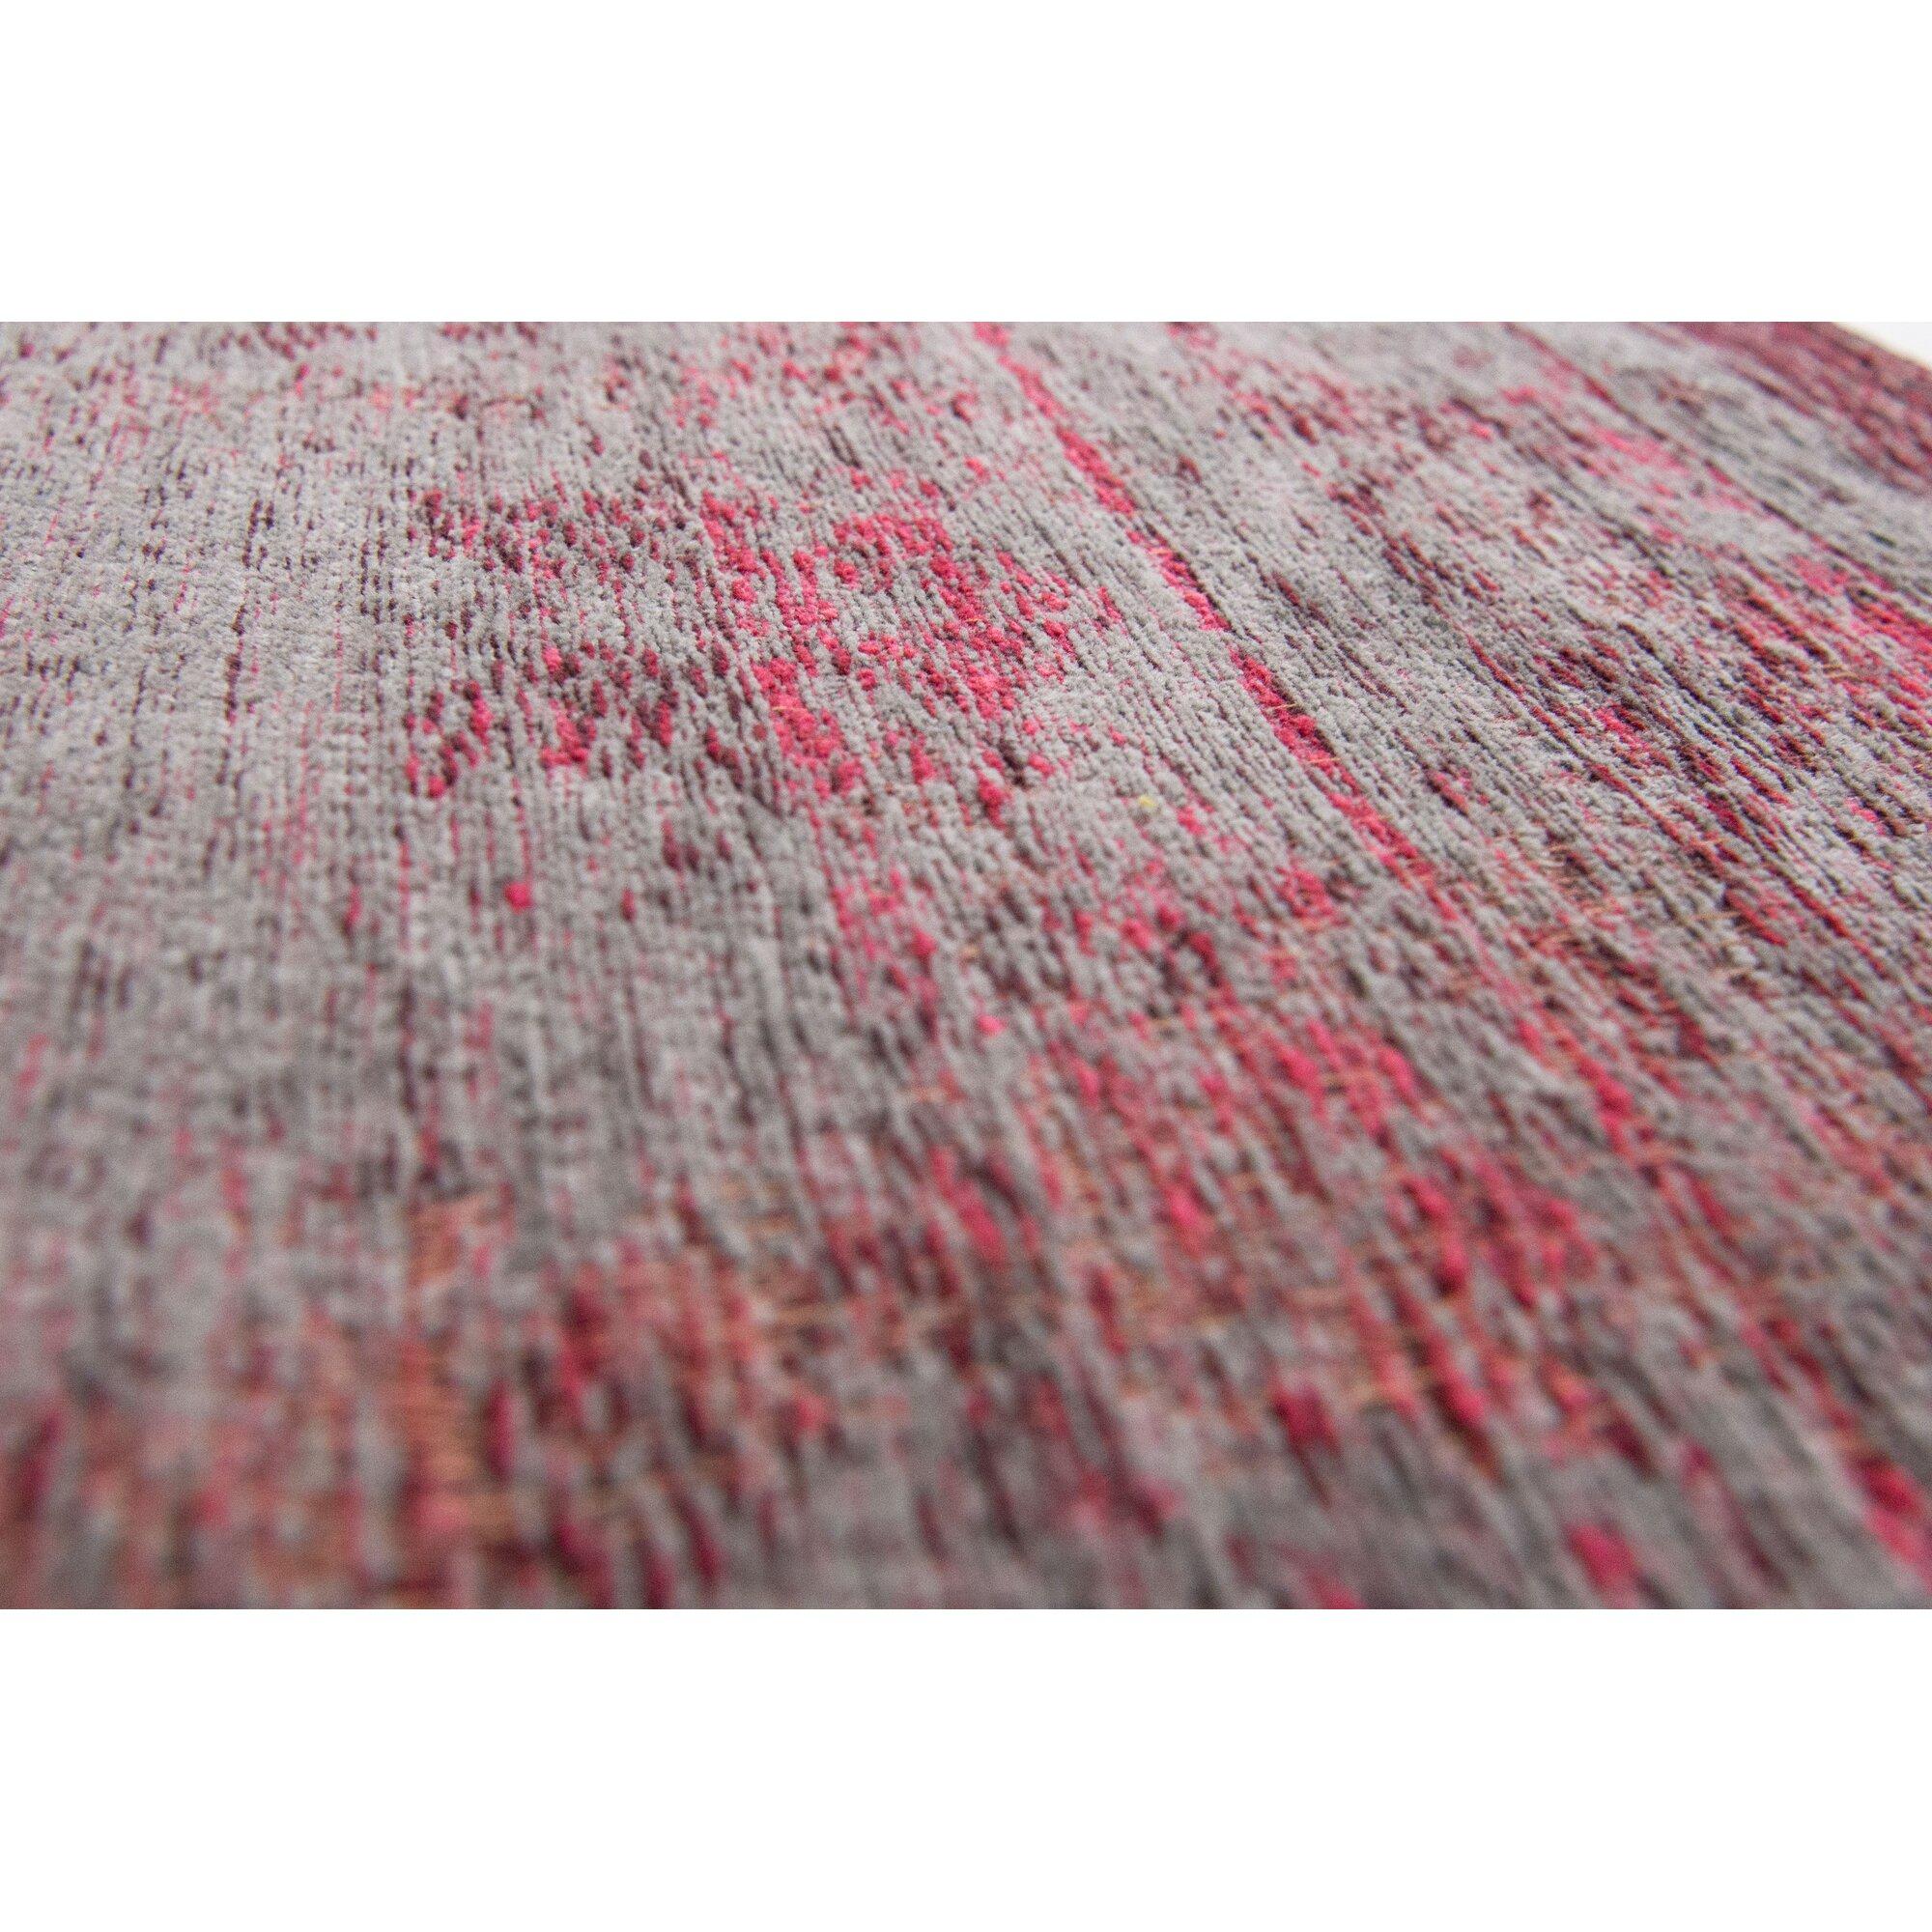 Caracella Teppich Fading World in GrauRosa  Wayfairde